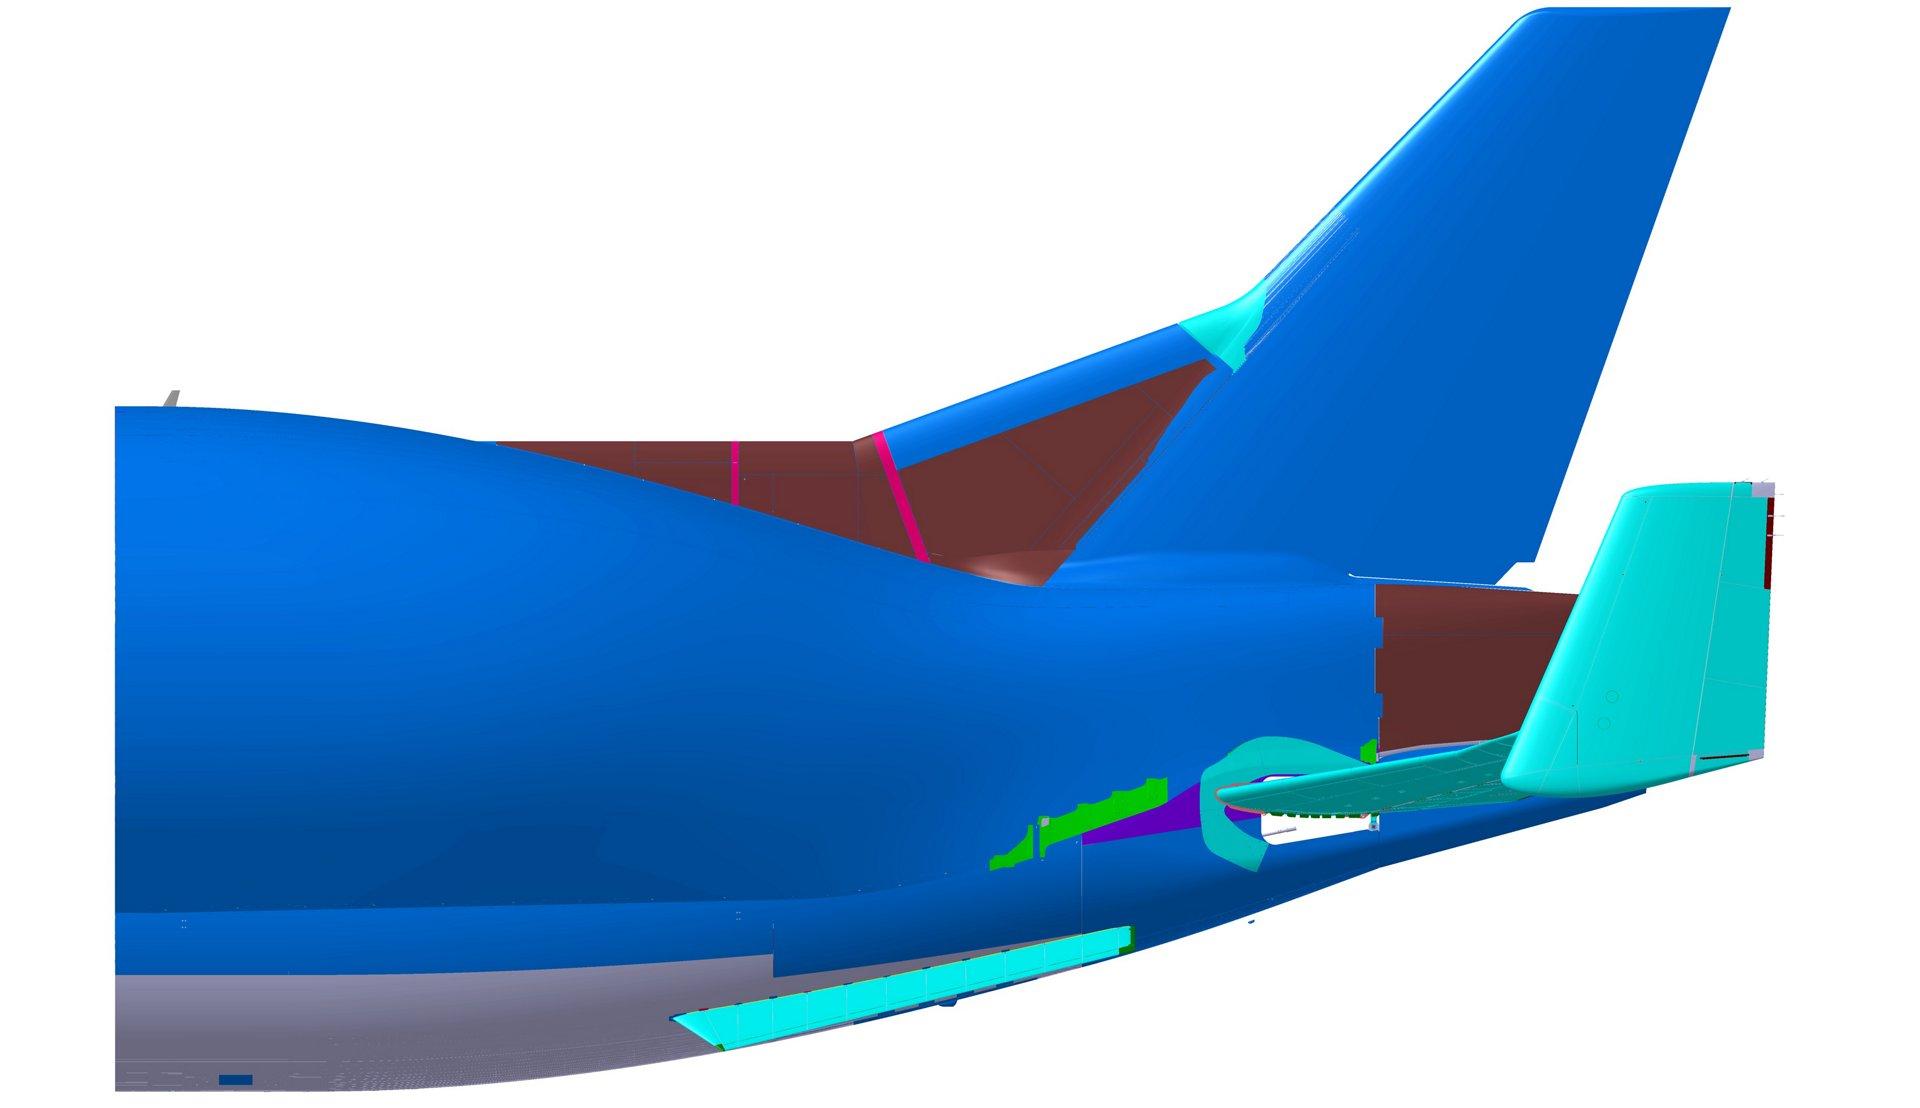 Beluga XL_Rear 2